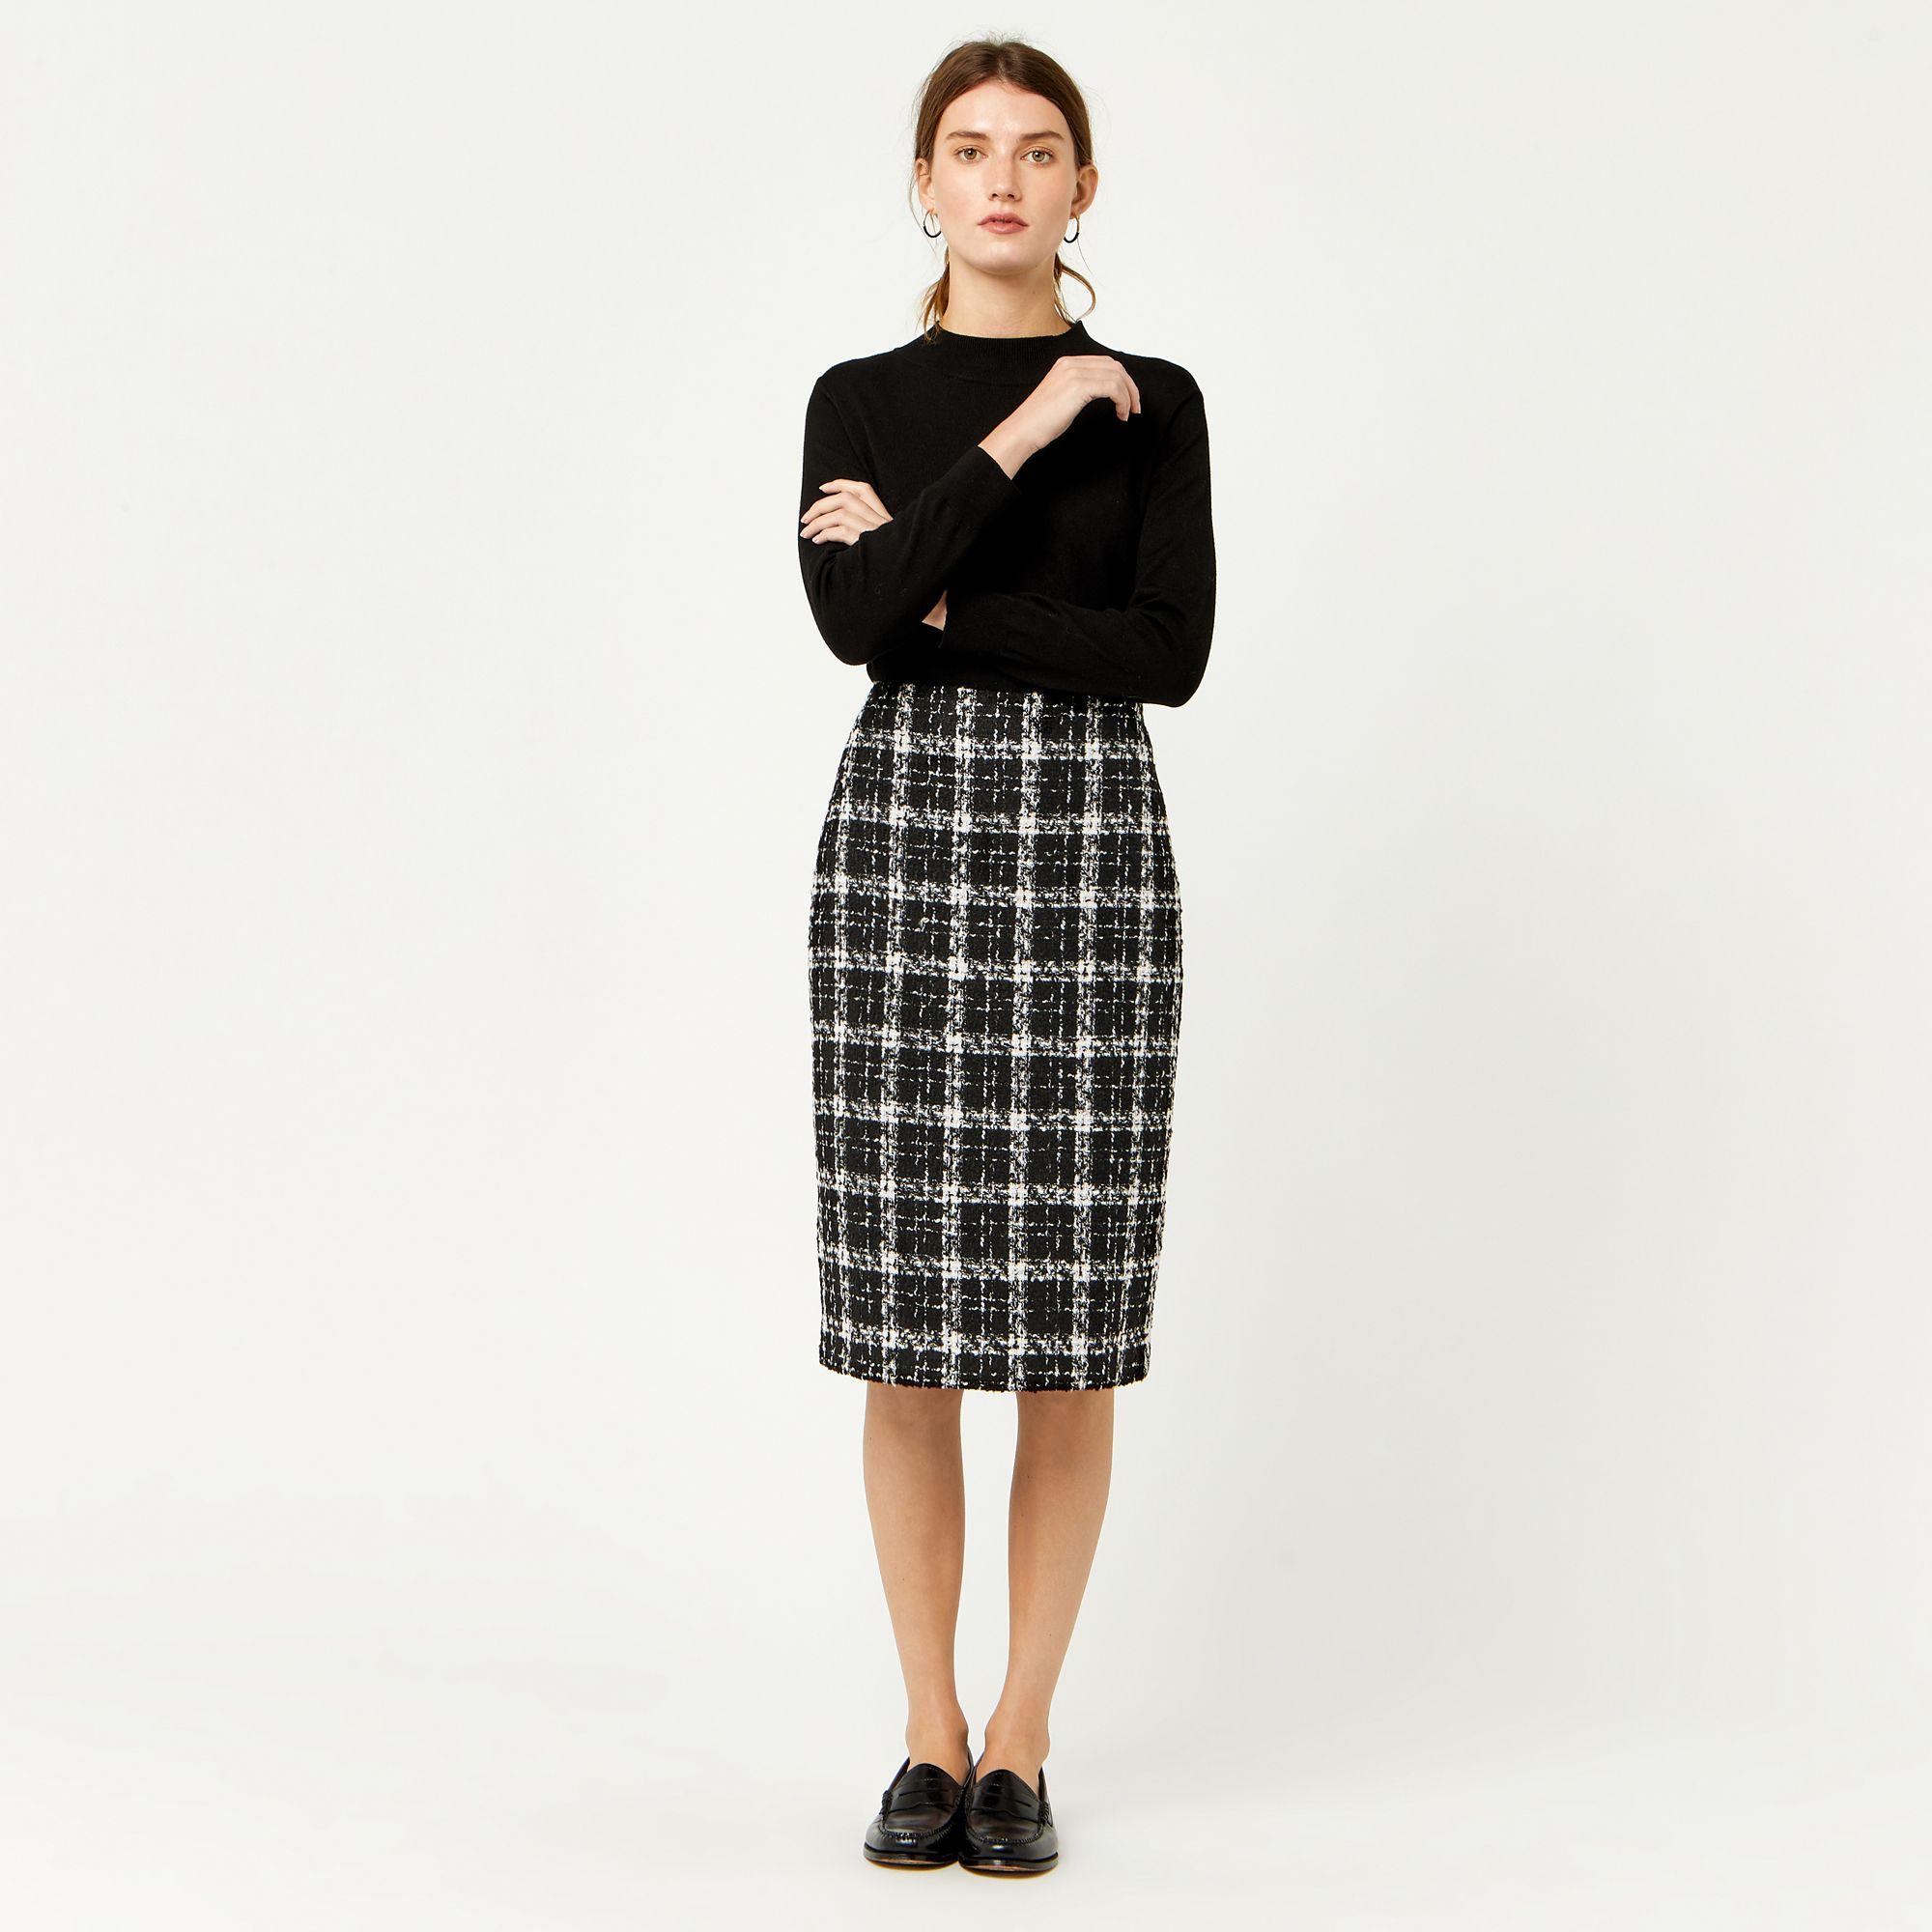 fdbb6c83900270 Warehouse, TWEED CHECK PENCIL SKIRT Multi 1 Plaid Pencil Skirt, Pencil Skirt  Outfits,